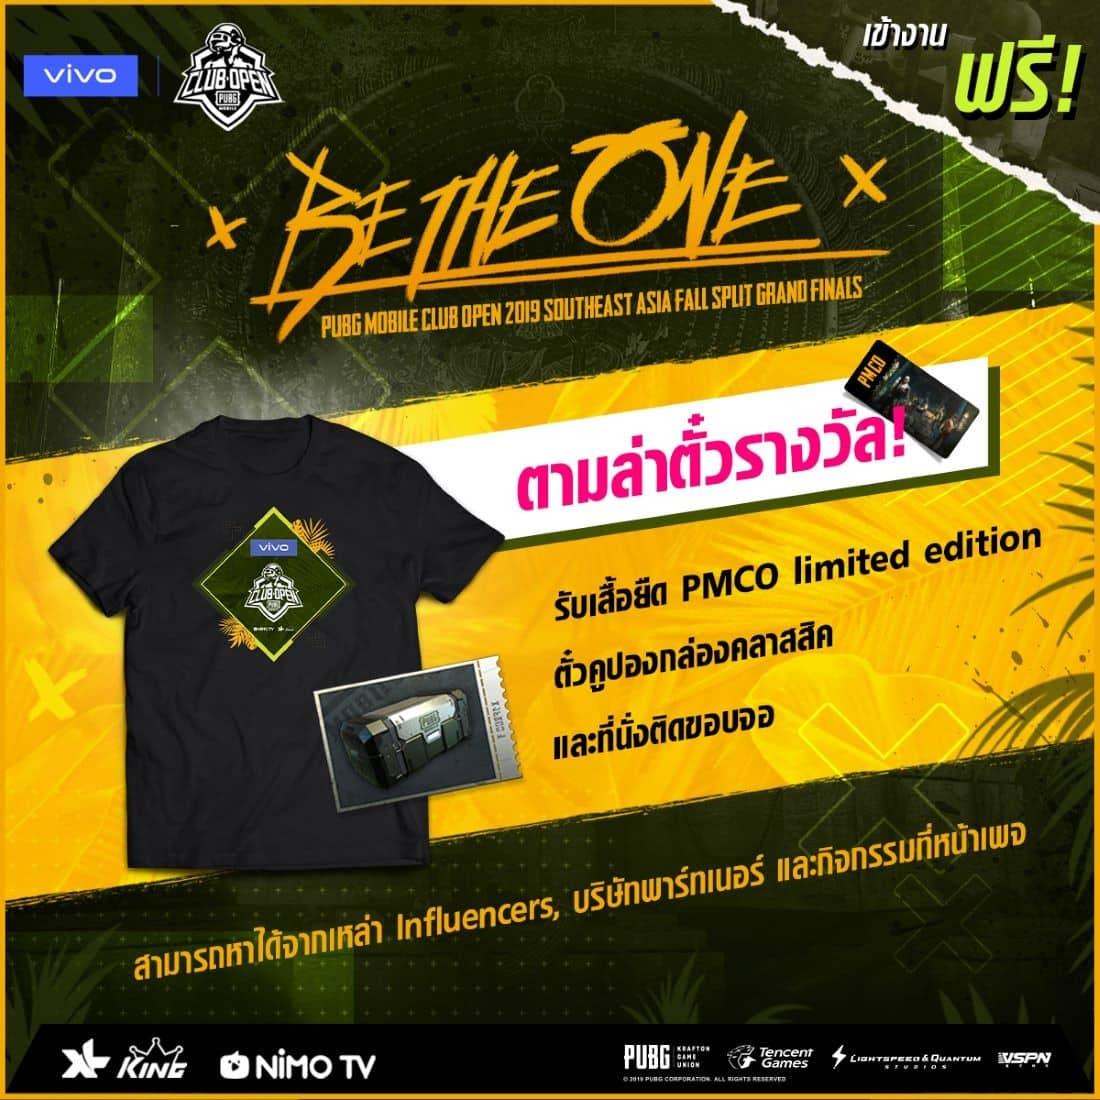 TicketGiveaway resize - ร่วมเชียร์ 5 ทีมอีสปอร์ตคนไทยในศึก PMCO SEA 2019 ฤดูกาล Fall split รอบ SEA Finals